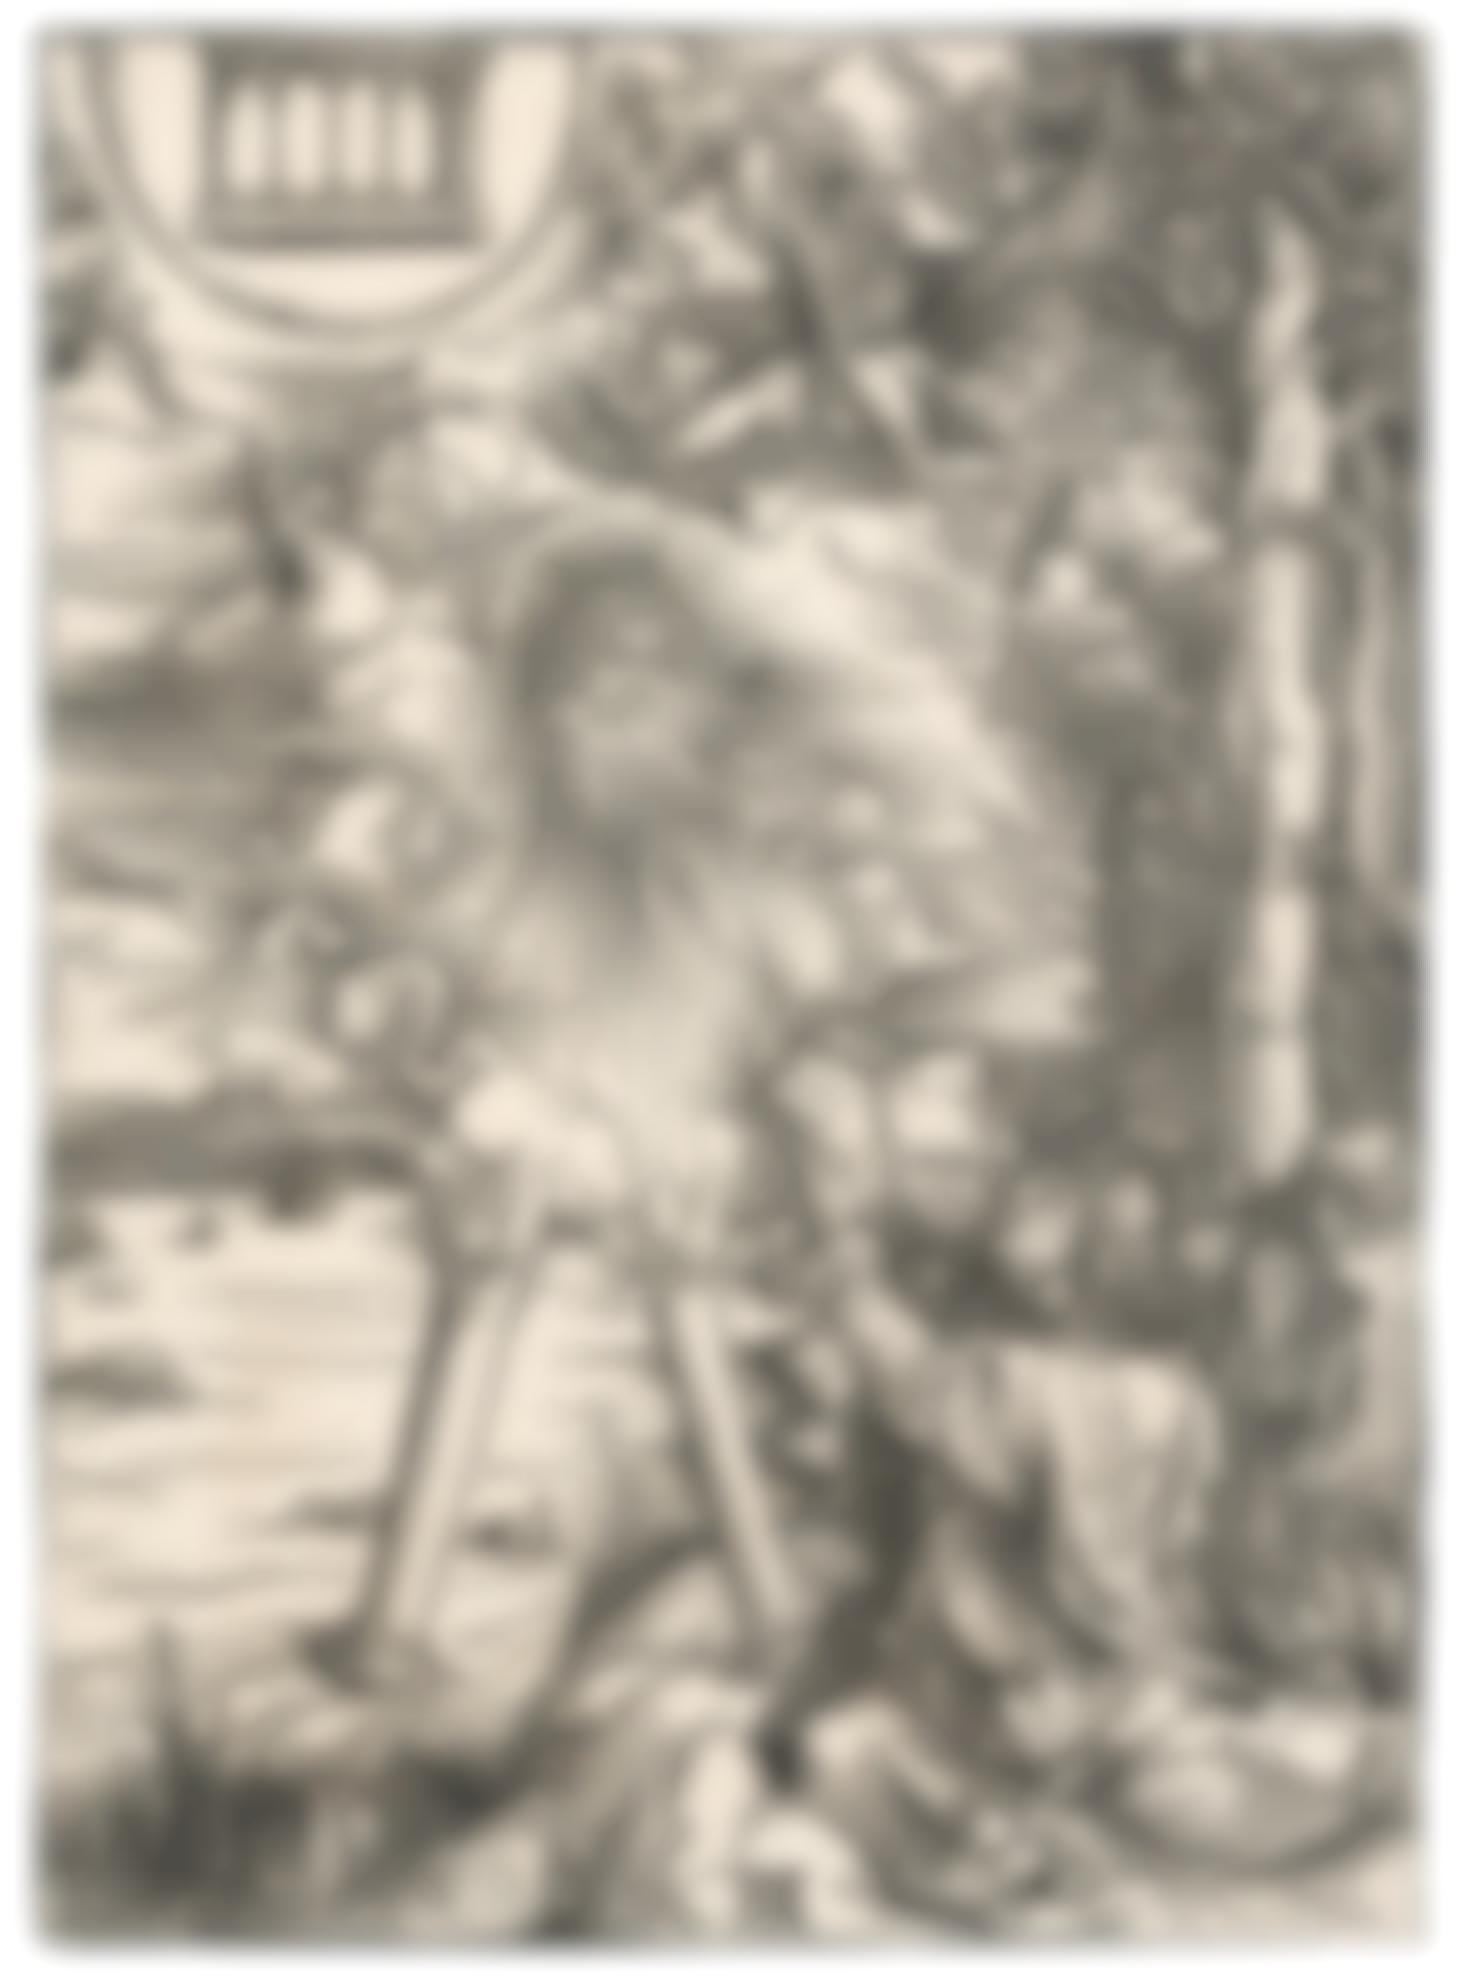 Albrecht Durer-St. John Devouring The Book; And The Torture Of St John The Evangelist (B. 70, 61; M., Holl. 172, 164)-1497